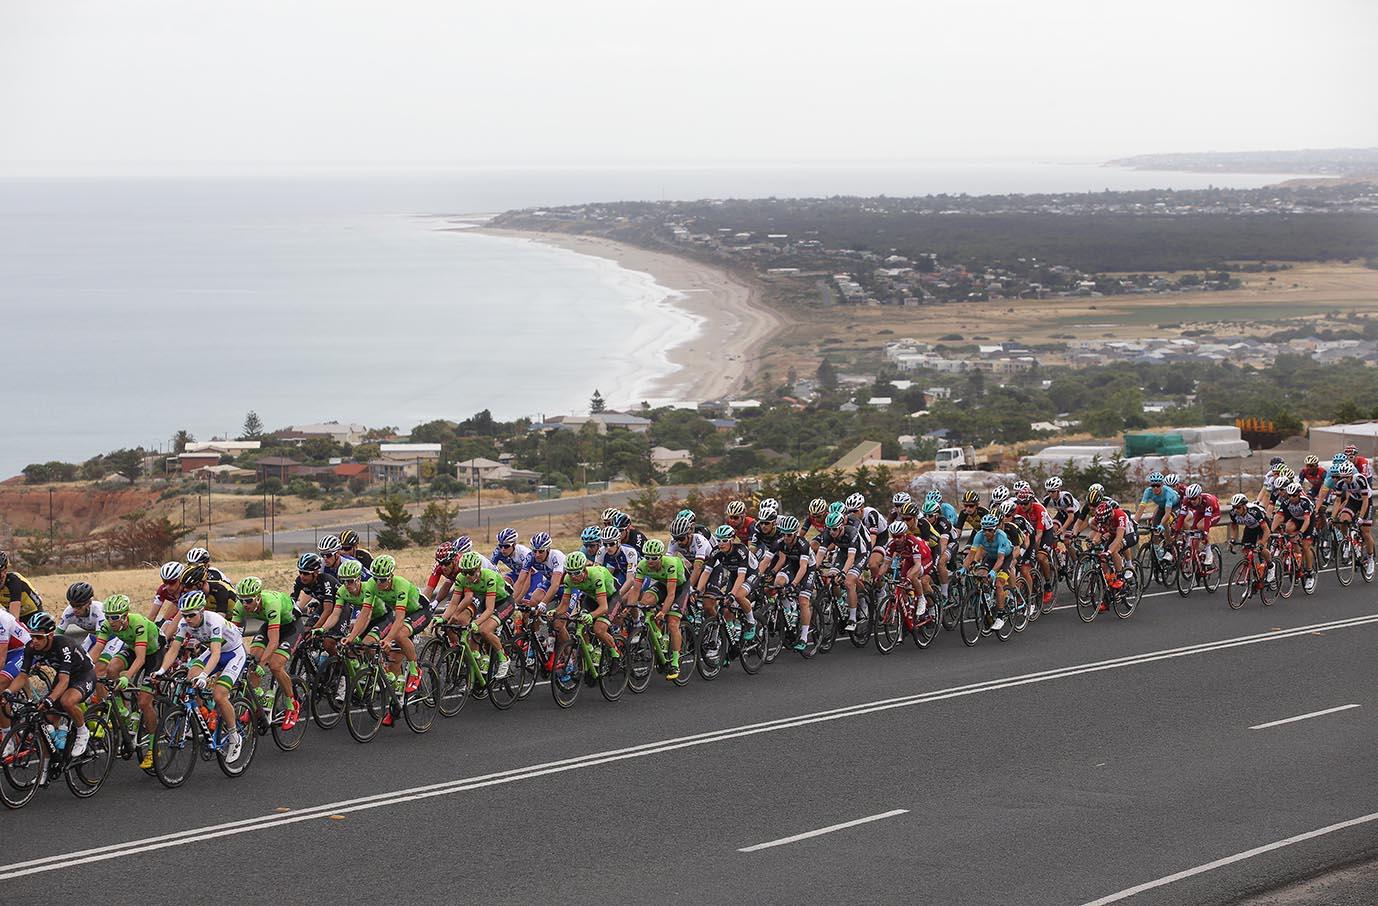 Riders climb Sellicks Hill overlooking Aldinga beach